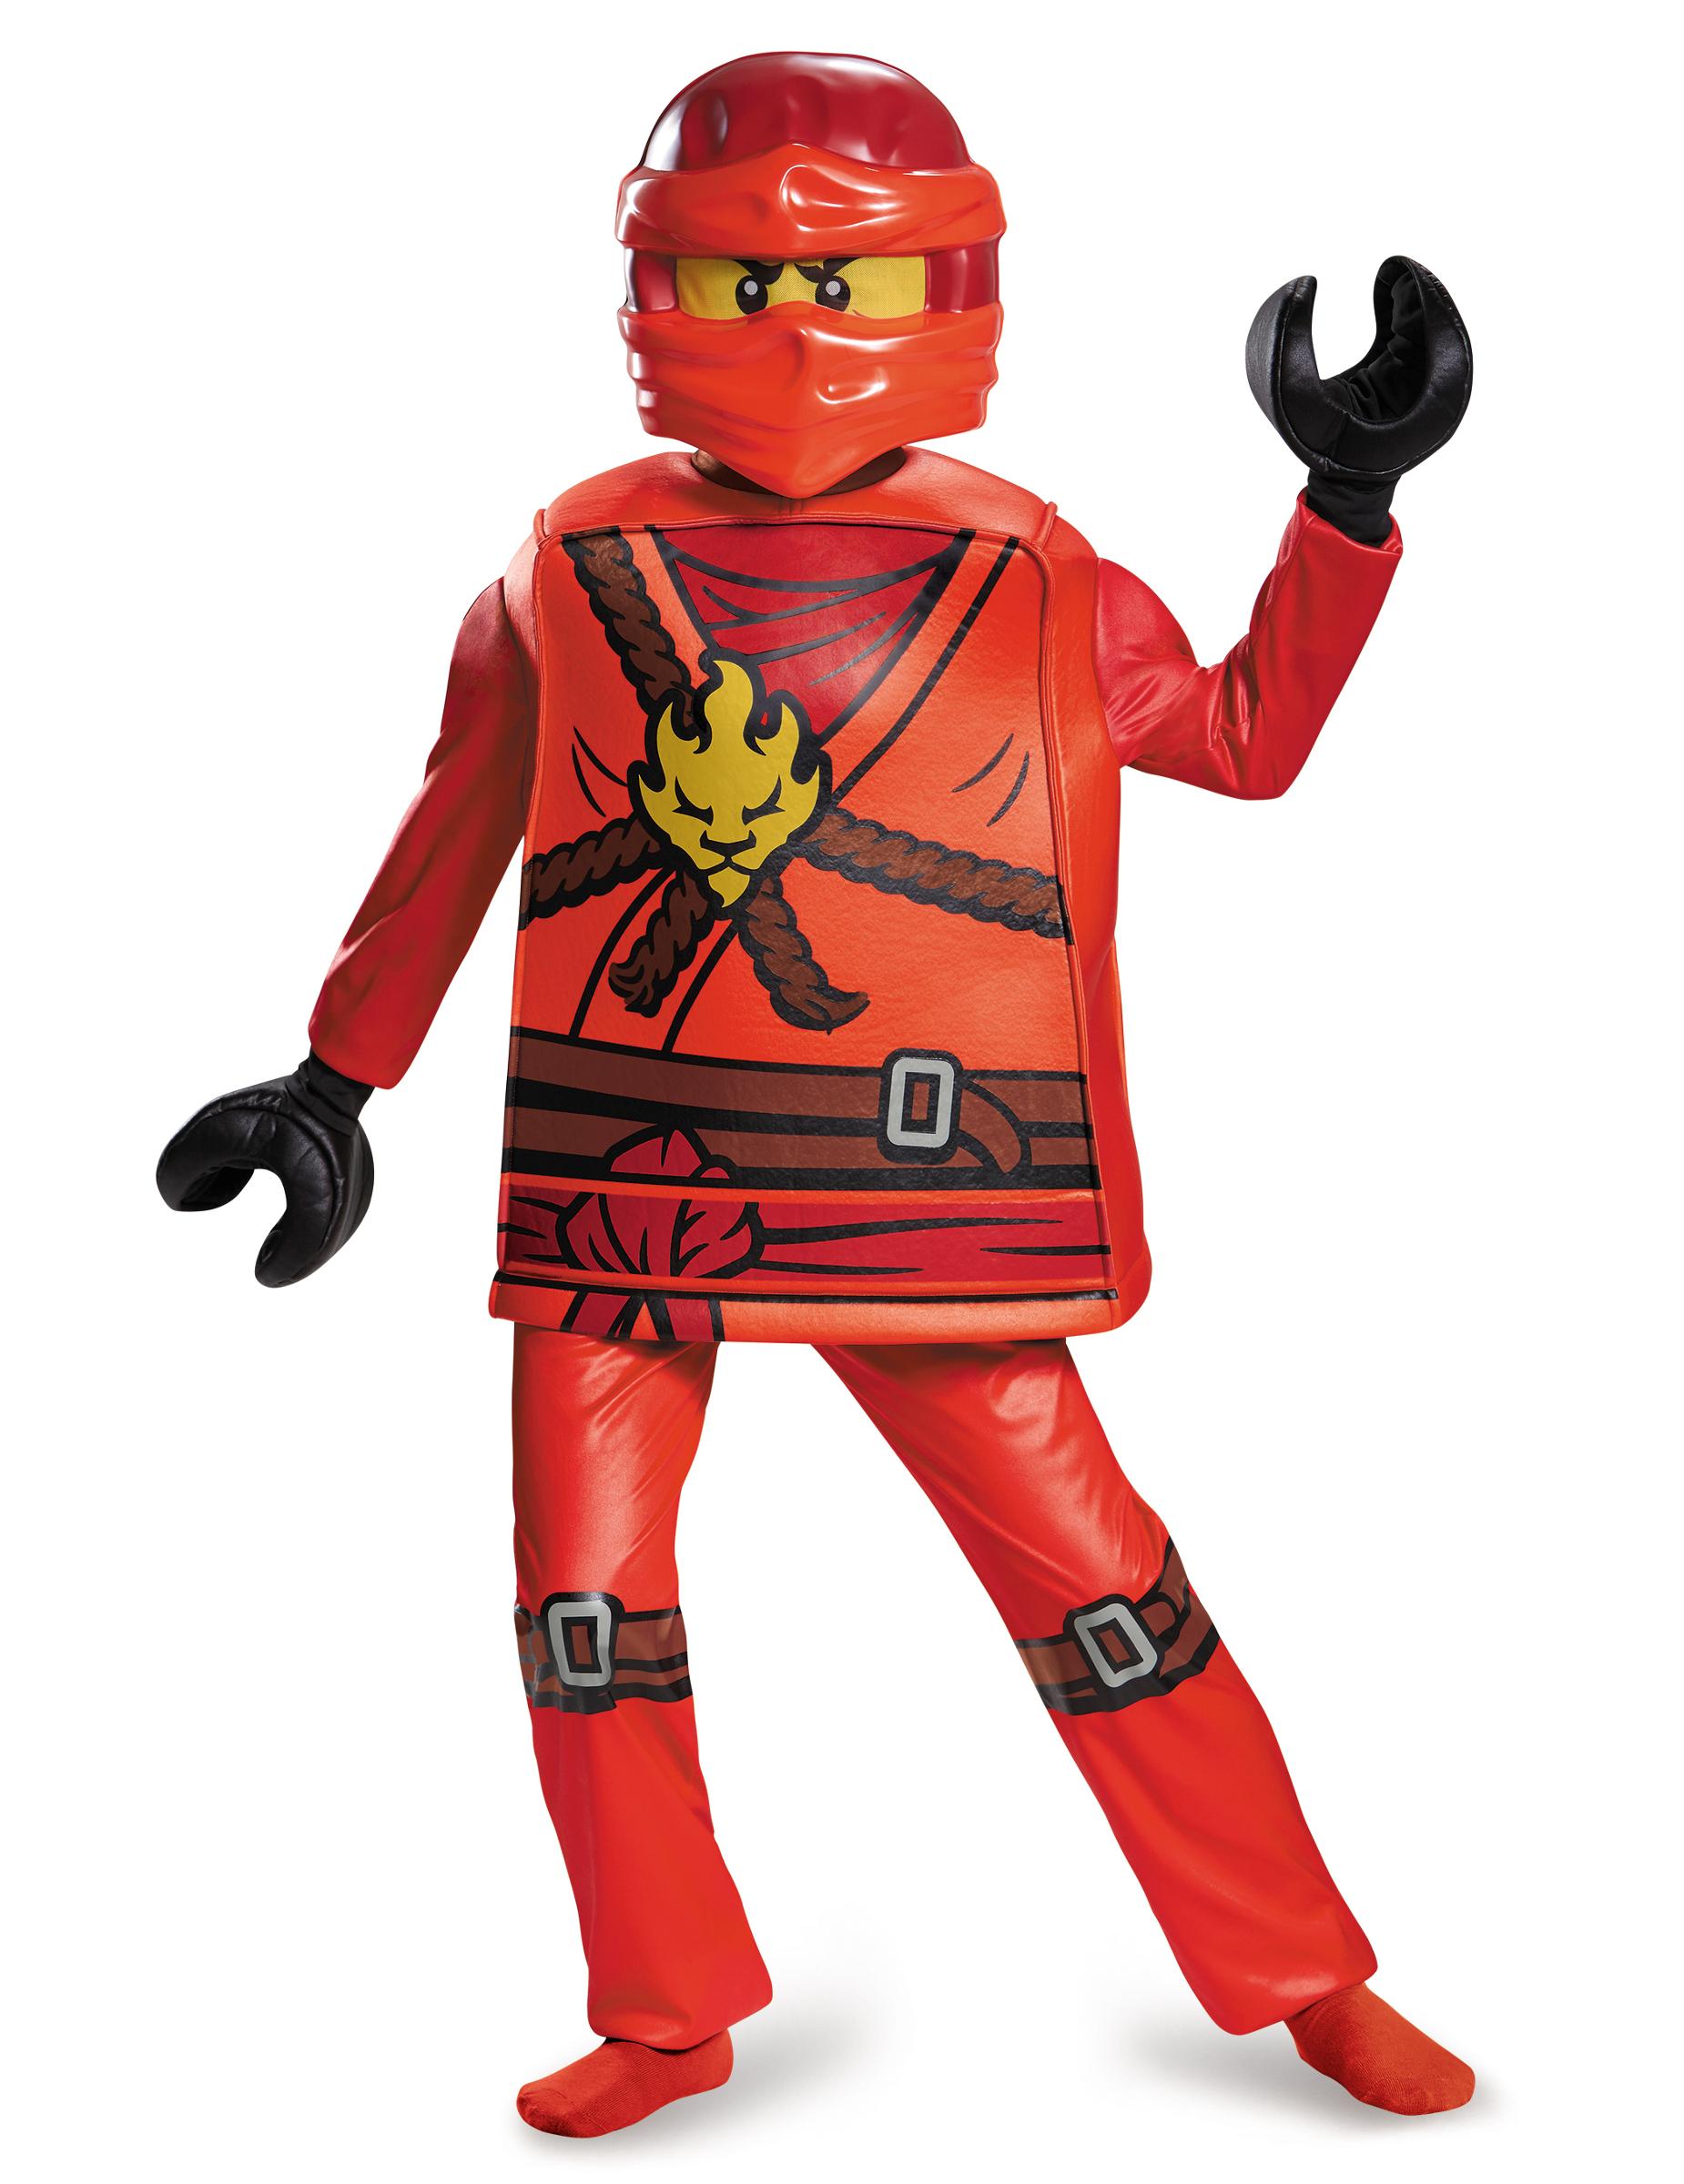 Kai ninjago lego kostuum voor jongens - Ninjago lego kai ...